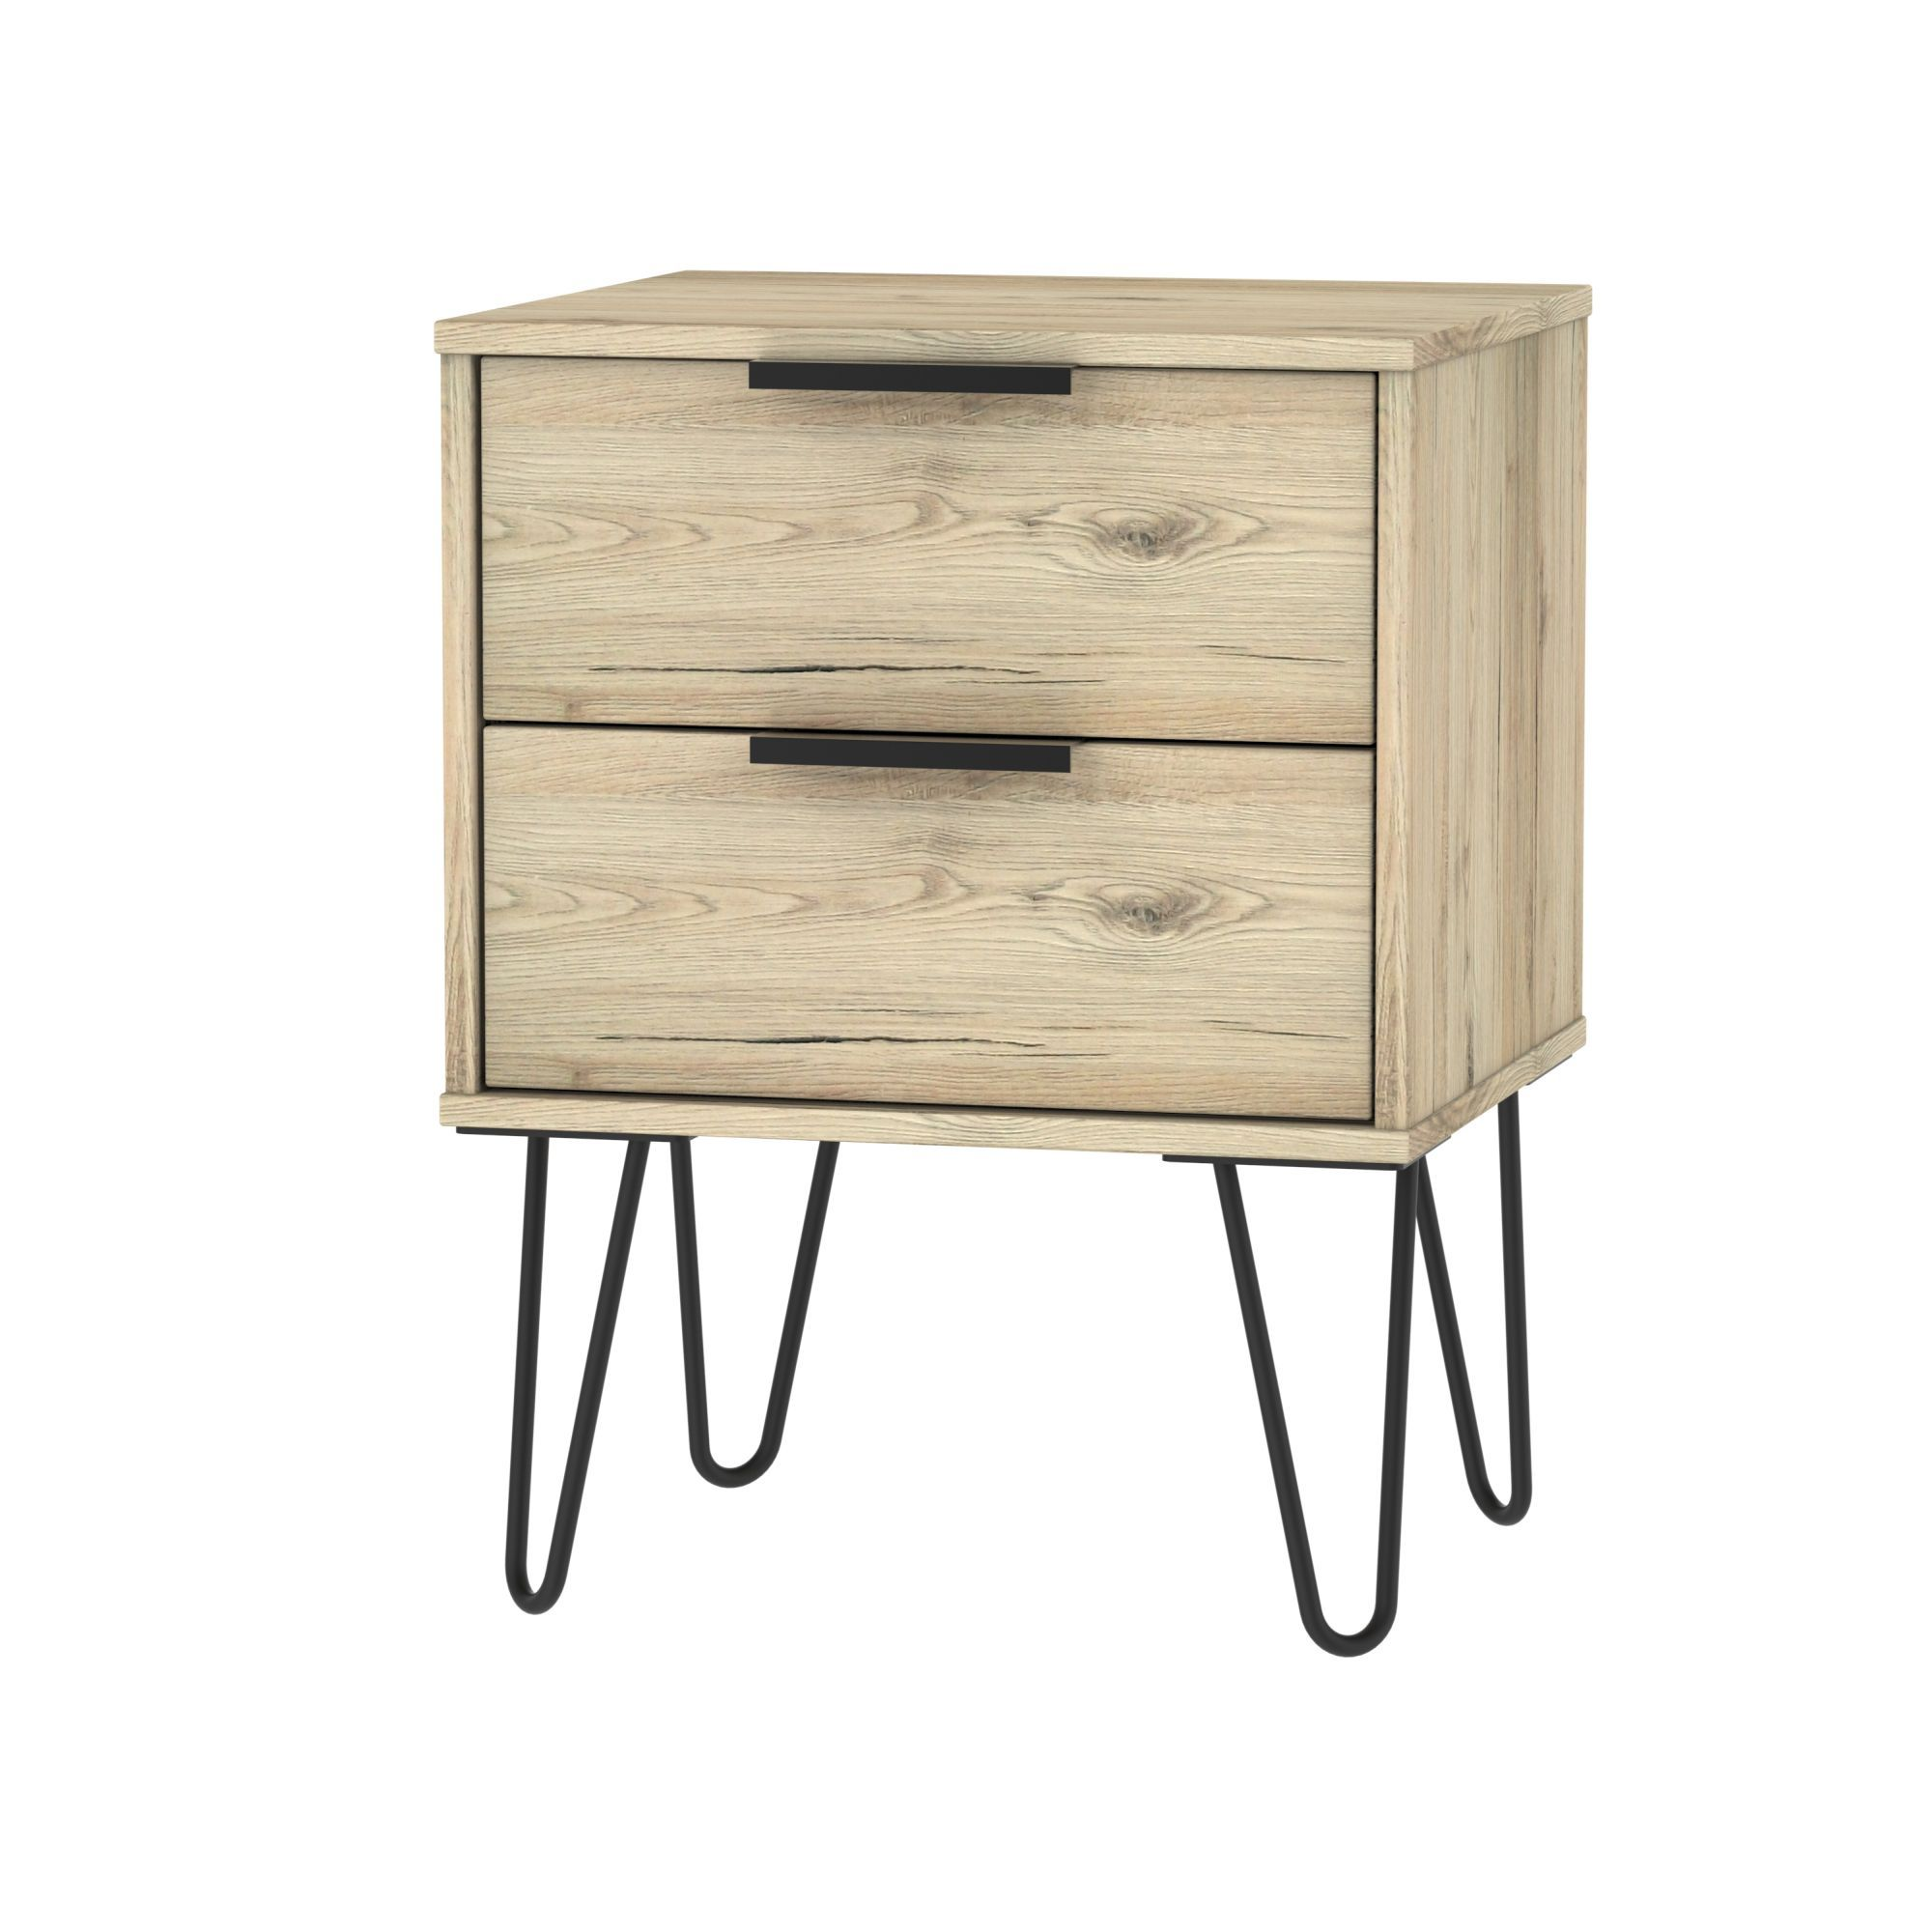 Manhattan Oak Effect 2 Drawer Bedside Chest H 570mm W 450mm D 395mm Departments Diy At B Q